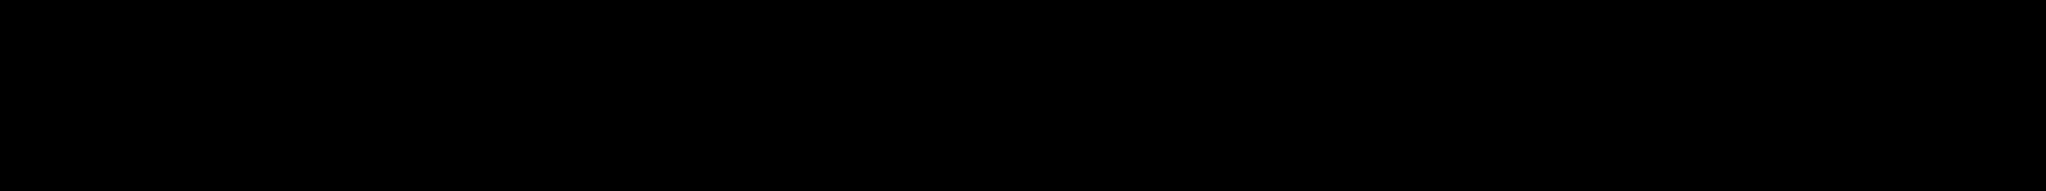 Design System B 100R